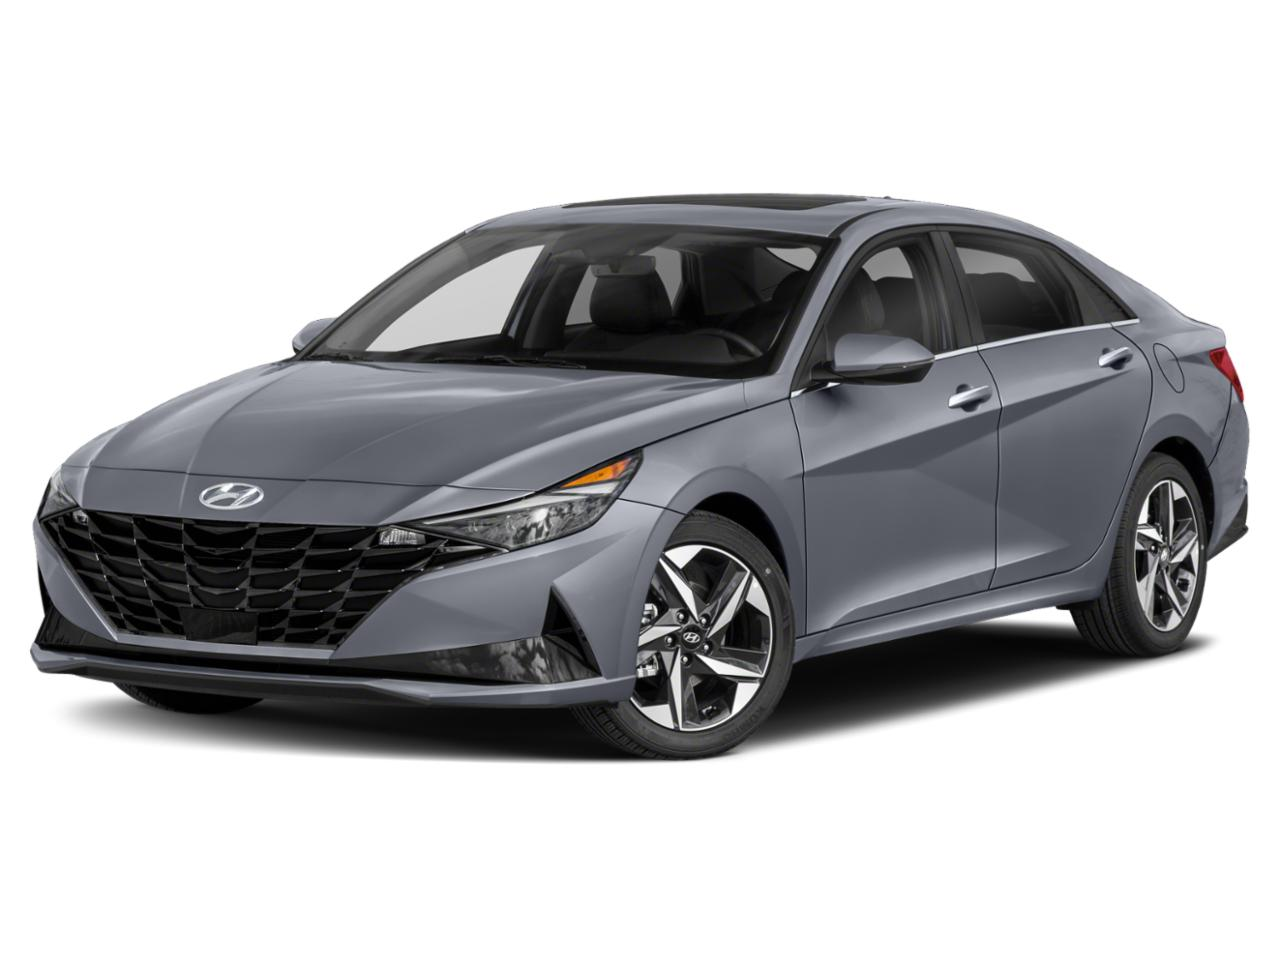 2022 Hyundai Elantra Vehicle Photo in Peoria, IL 61615